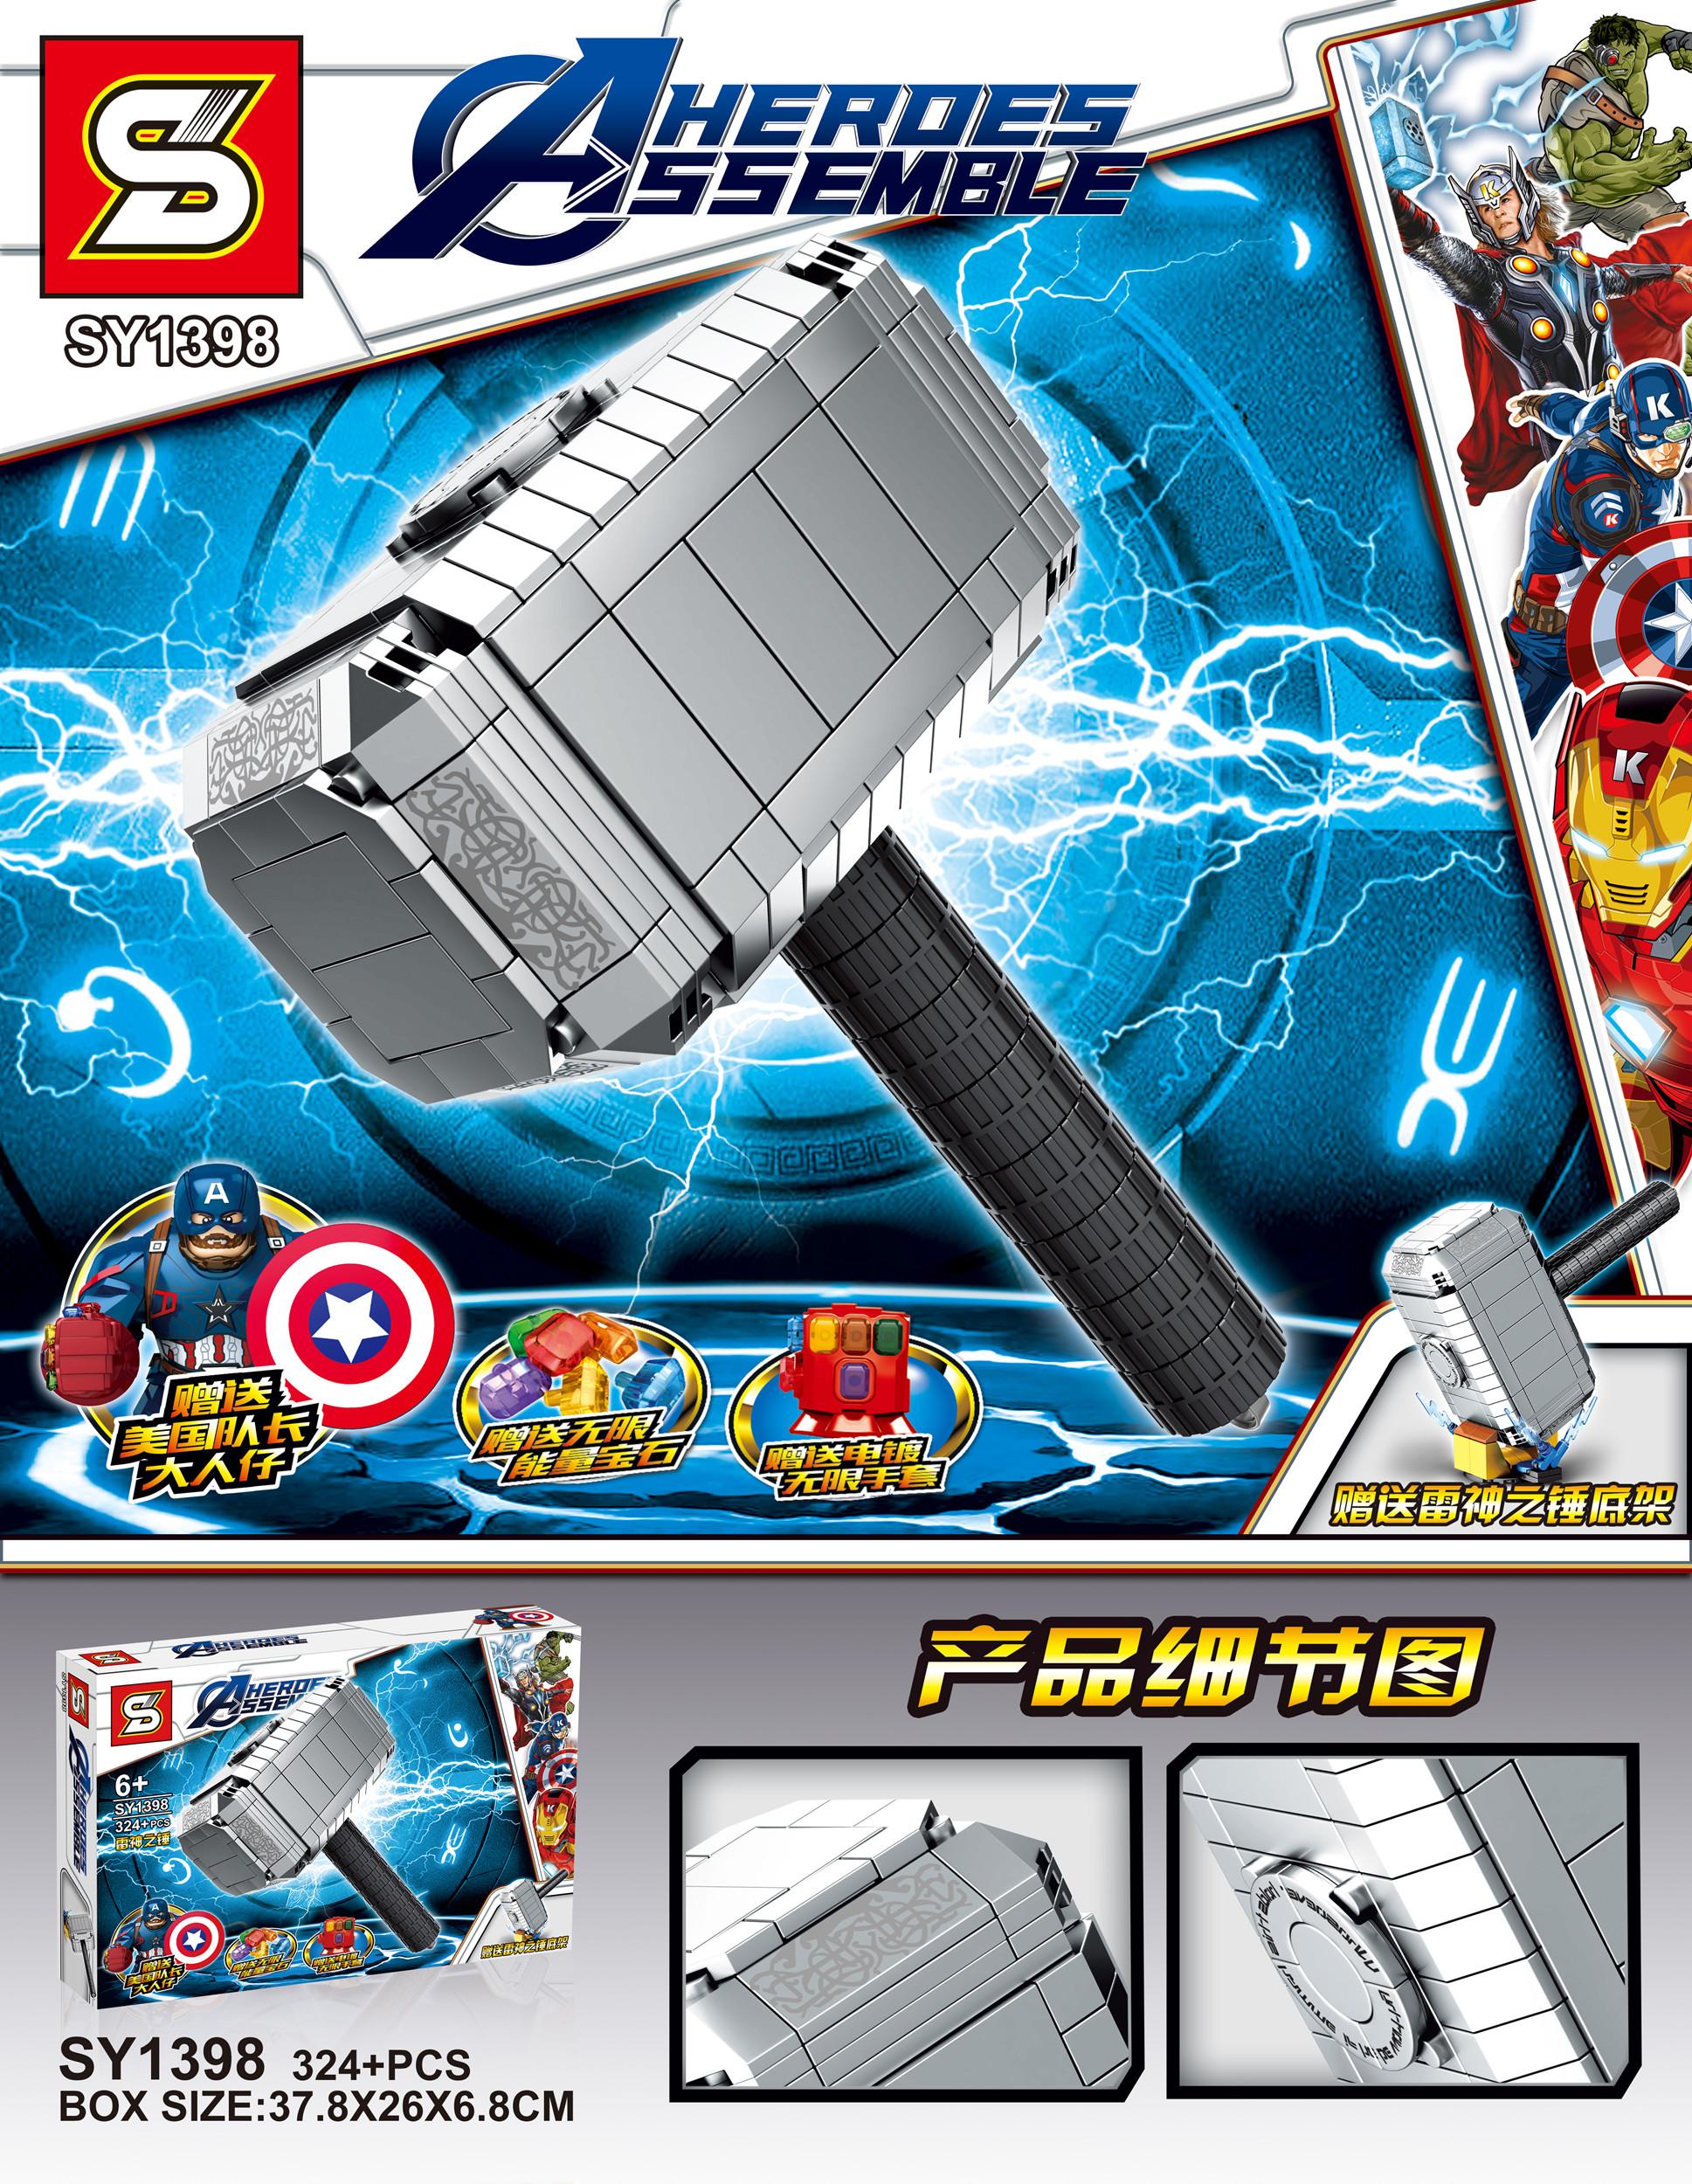 Custom Avengers 4 Mjolnir Thor Hammer Building Blocks Toy Set 324 Pieces